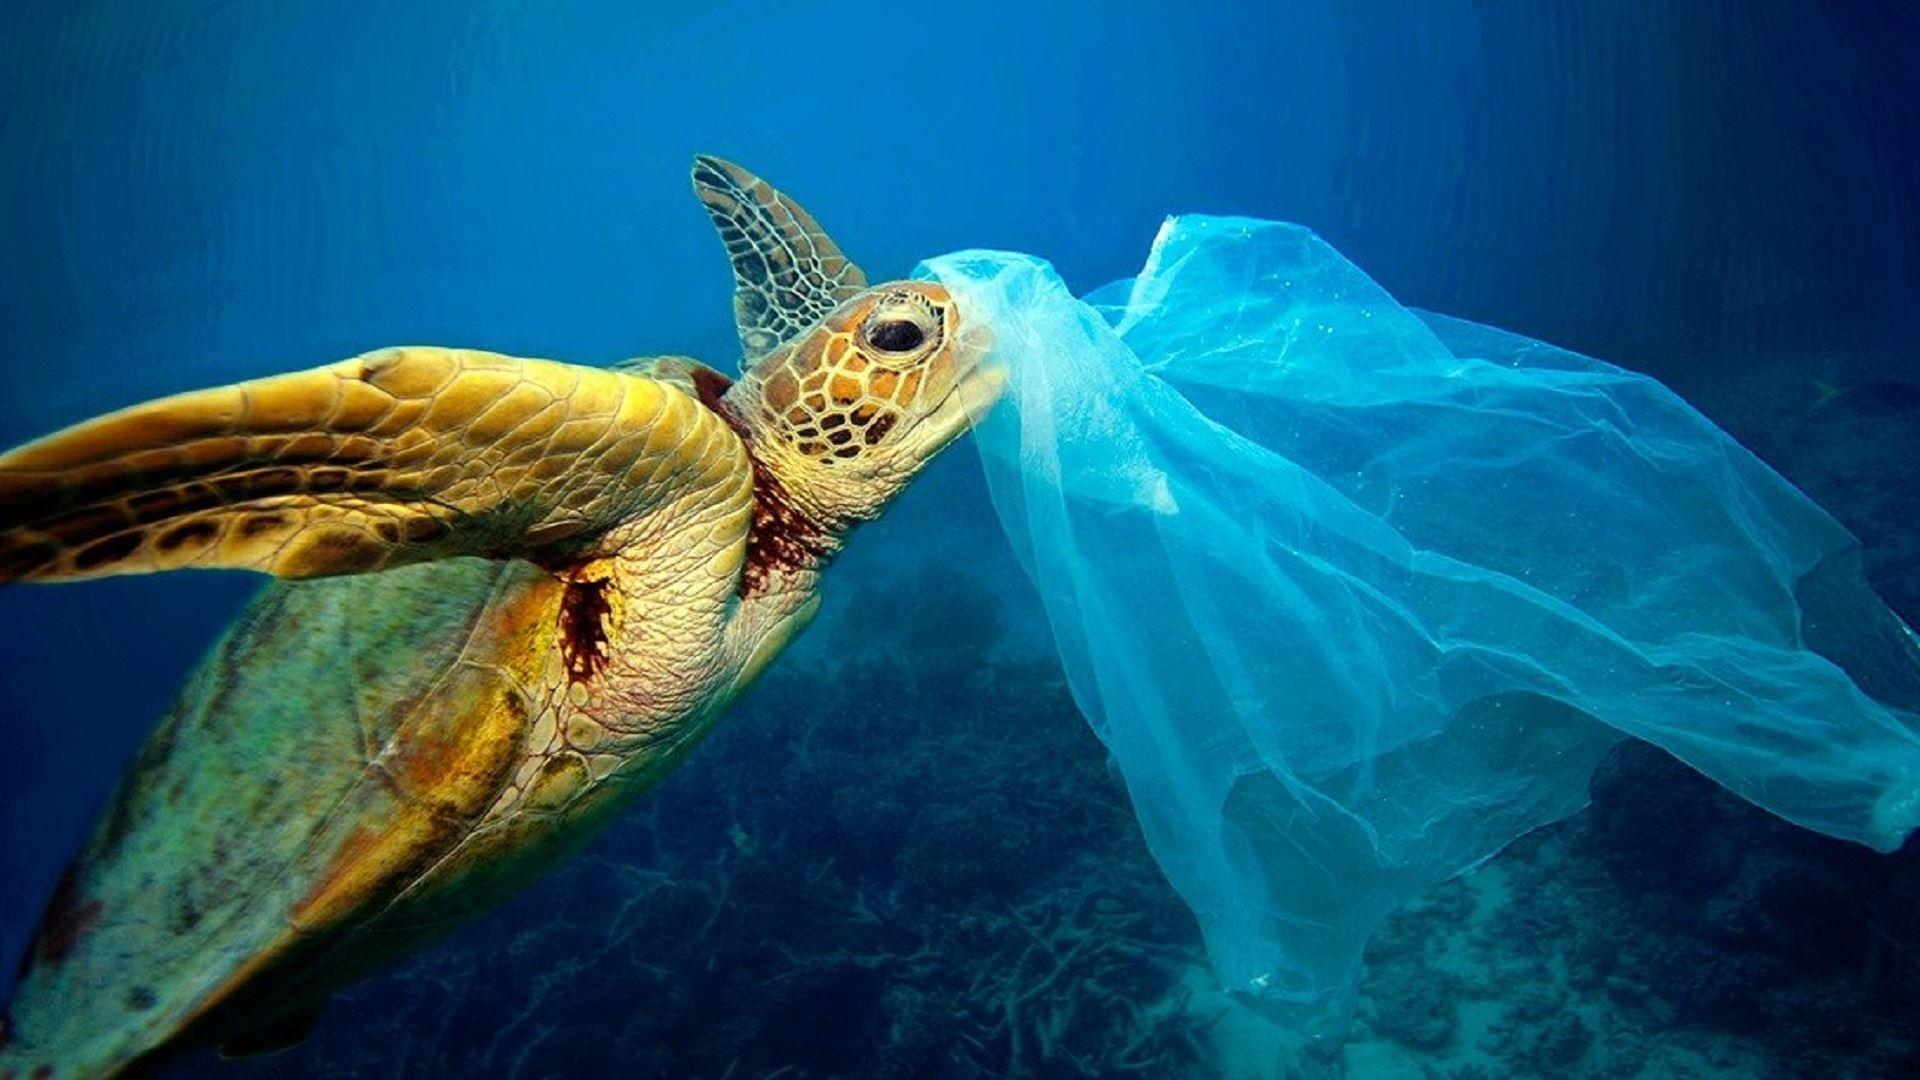 Filmvisning: A Plastic Ocean